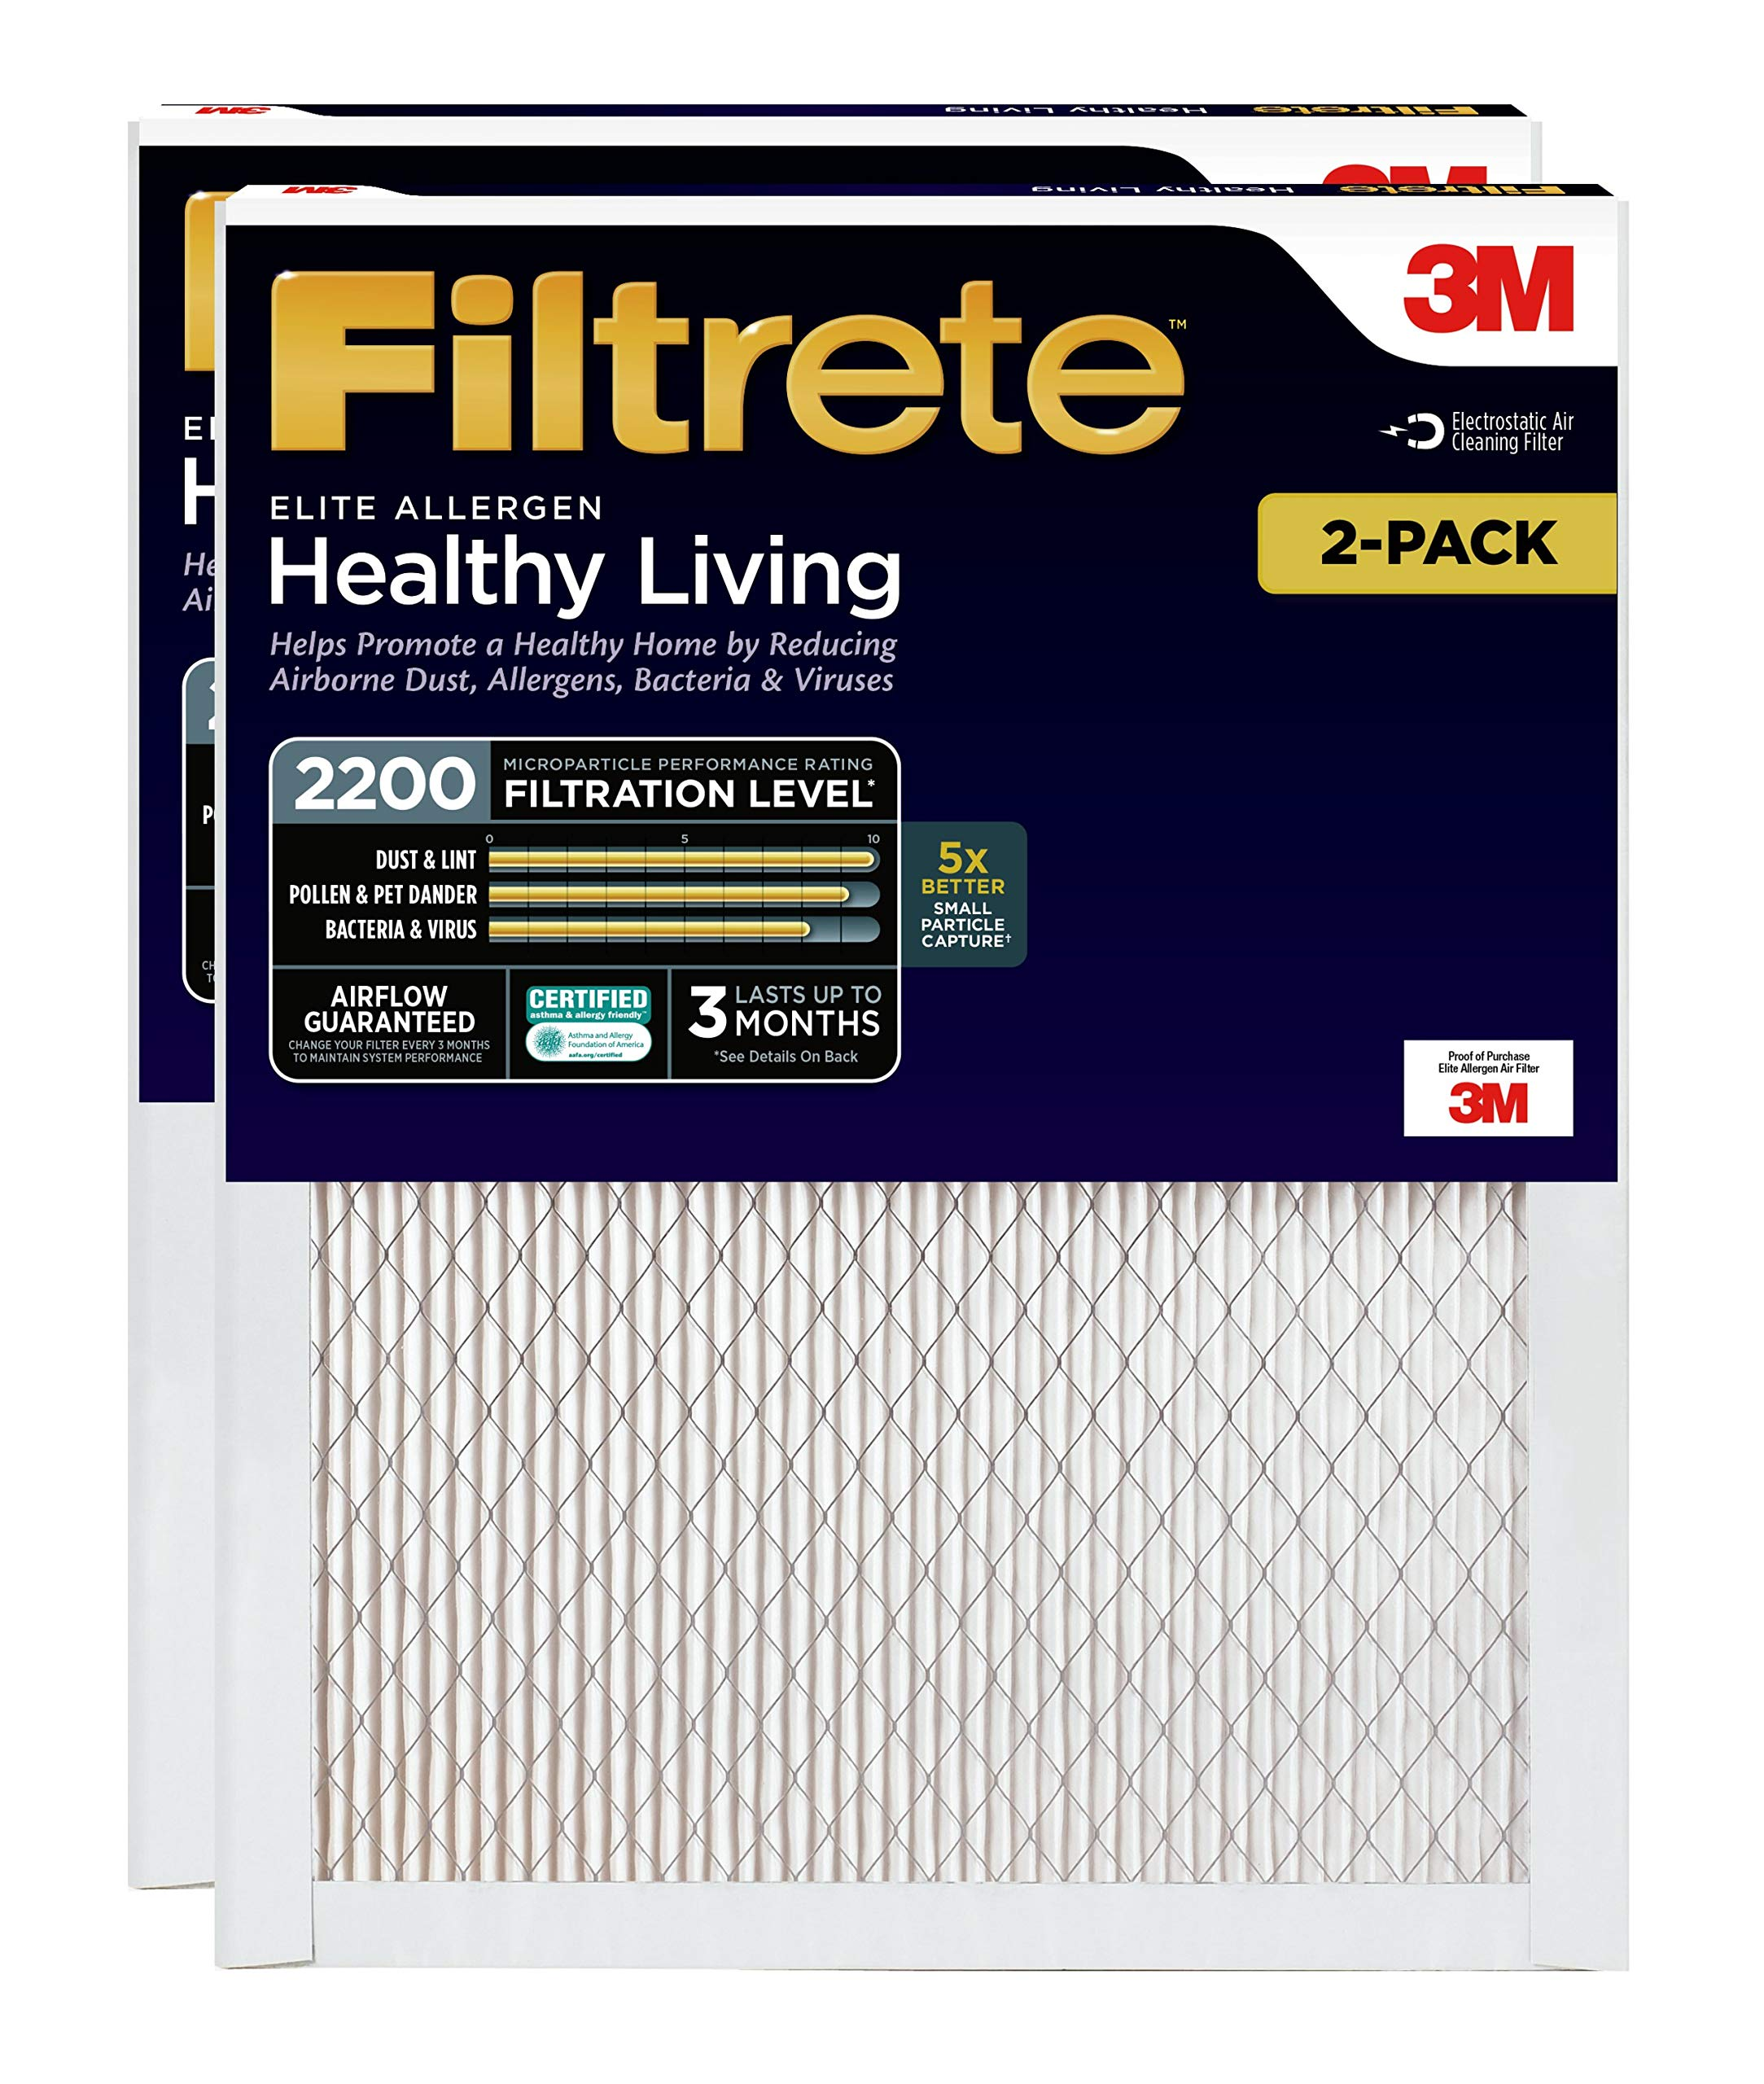 Filtrete 20x30x1, AC Furnace Air Filter, MPR 2200, Healthy Living Elite Allergen, 2-Pack